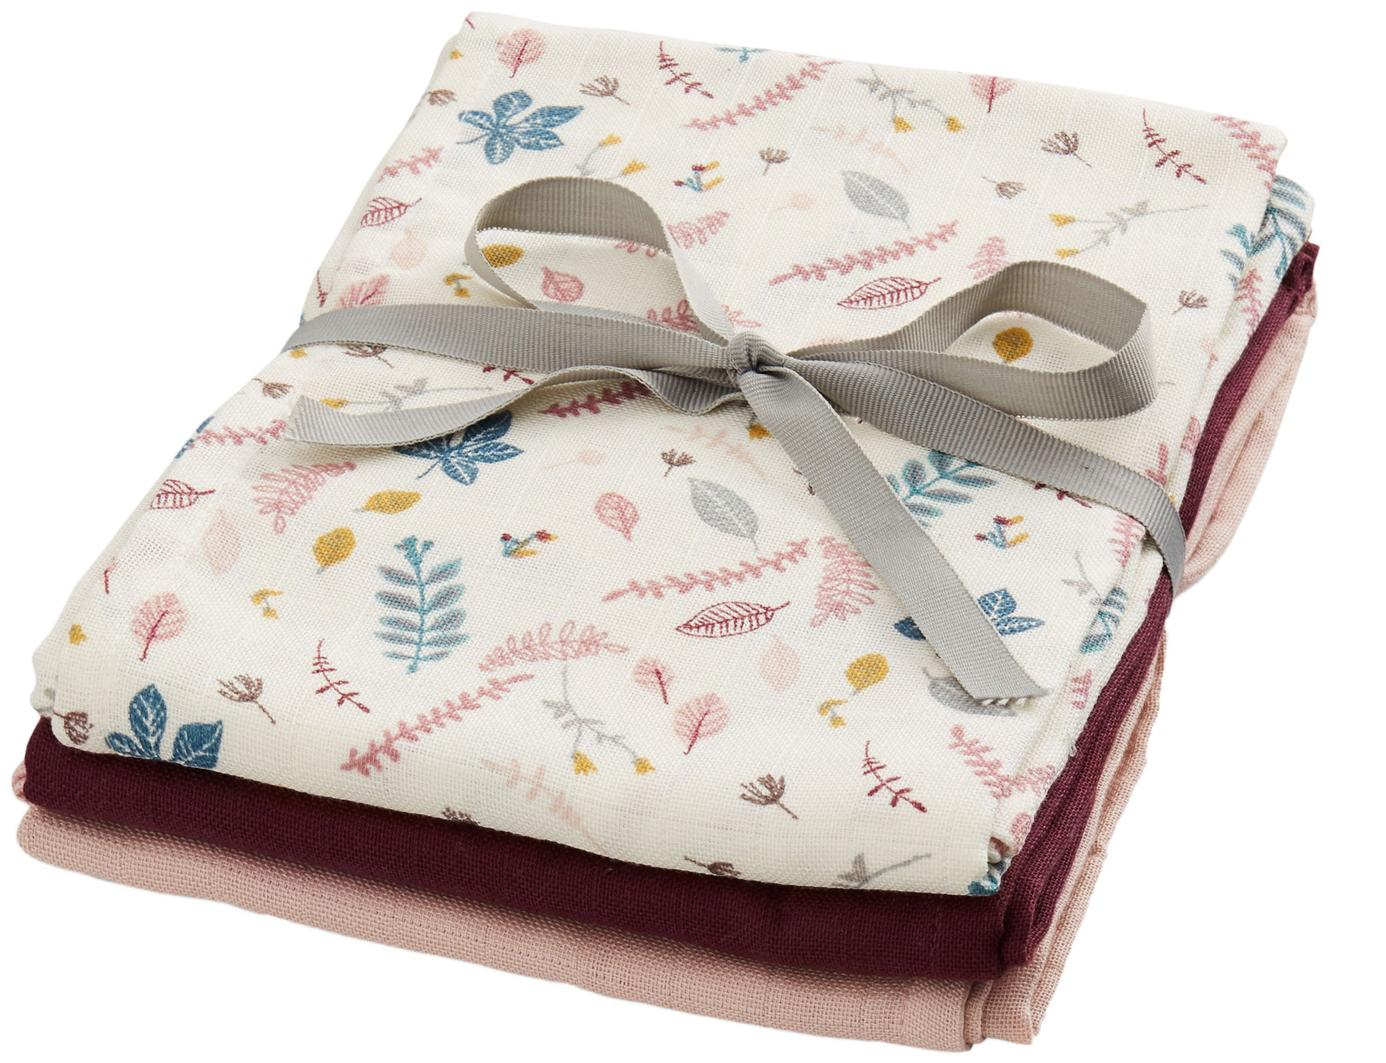 Set pañales de tela Pressed Leaves, 3pzas., Algodón orgánico, Crema, rosa, azul, gris, rojo oscuro, An 70 x L 70 cm